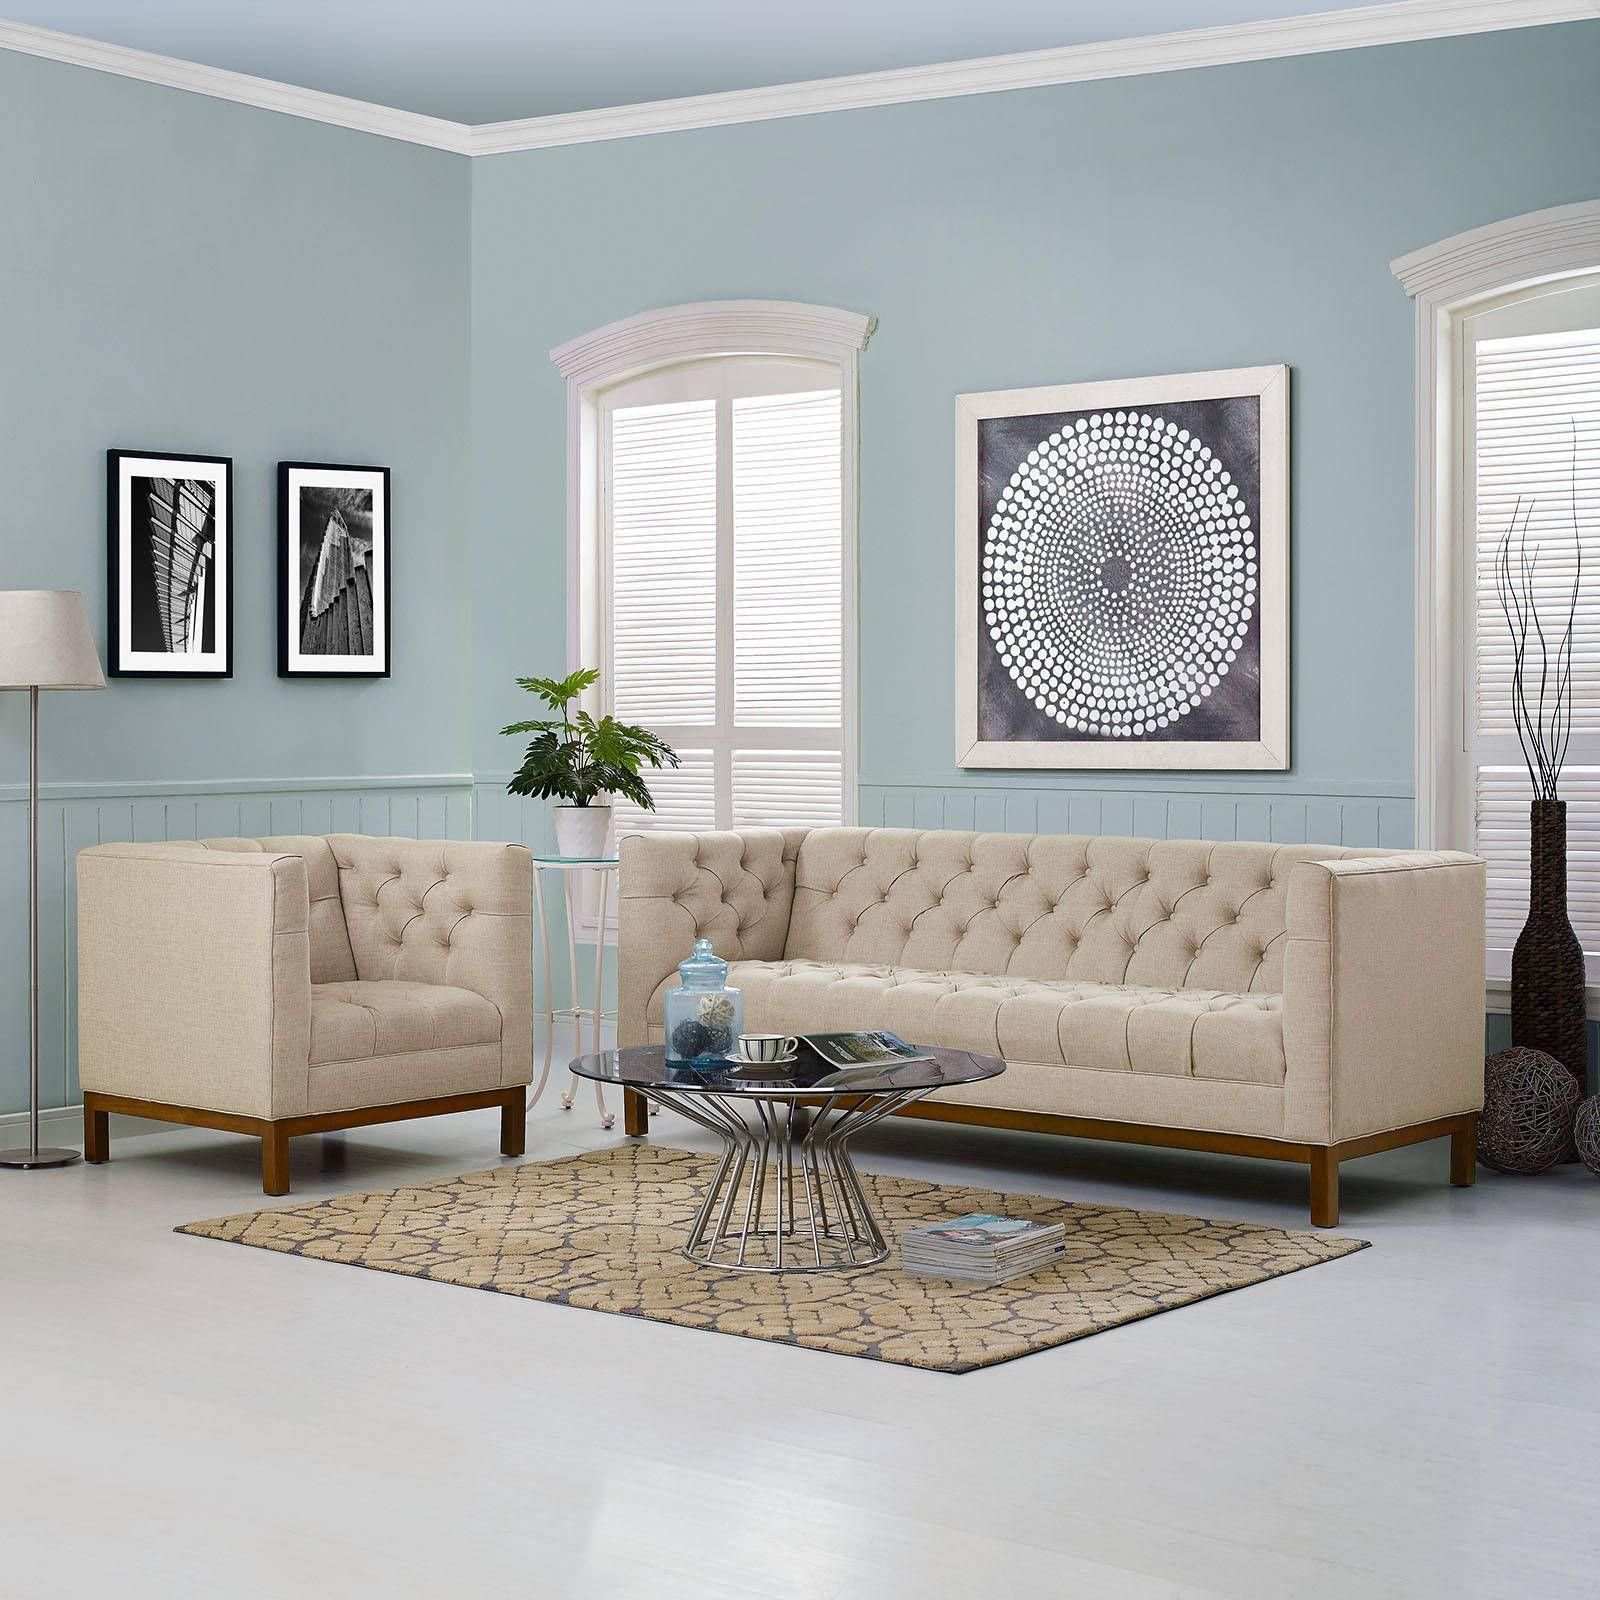 Best Panache Vintage Beige Fabric Solid Wood 2Pc Living Room Set 400 x 300